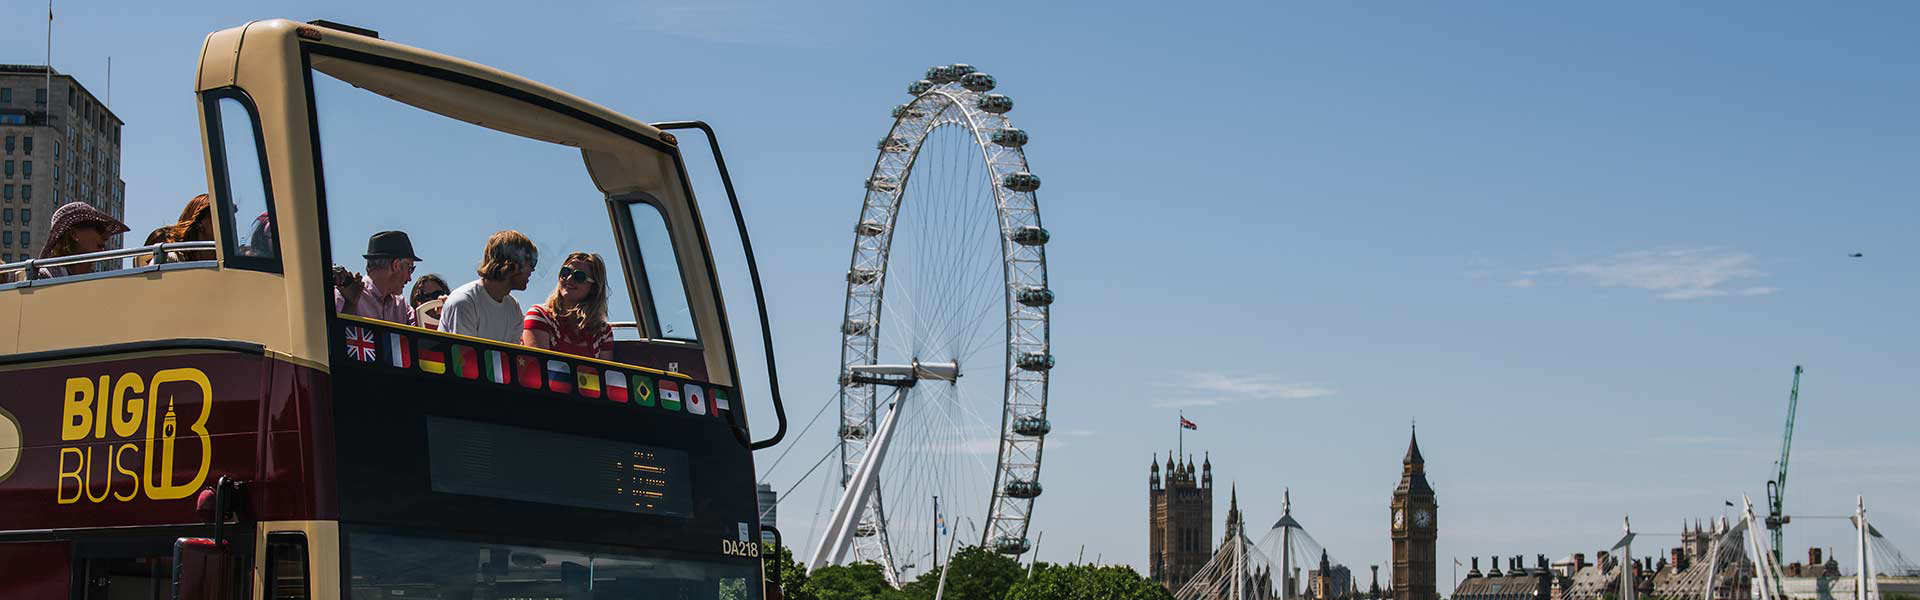 Big Bus Tours fährt an London Eye vorbei